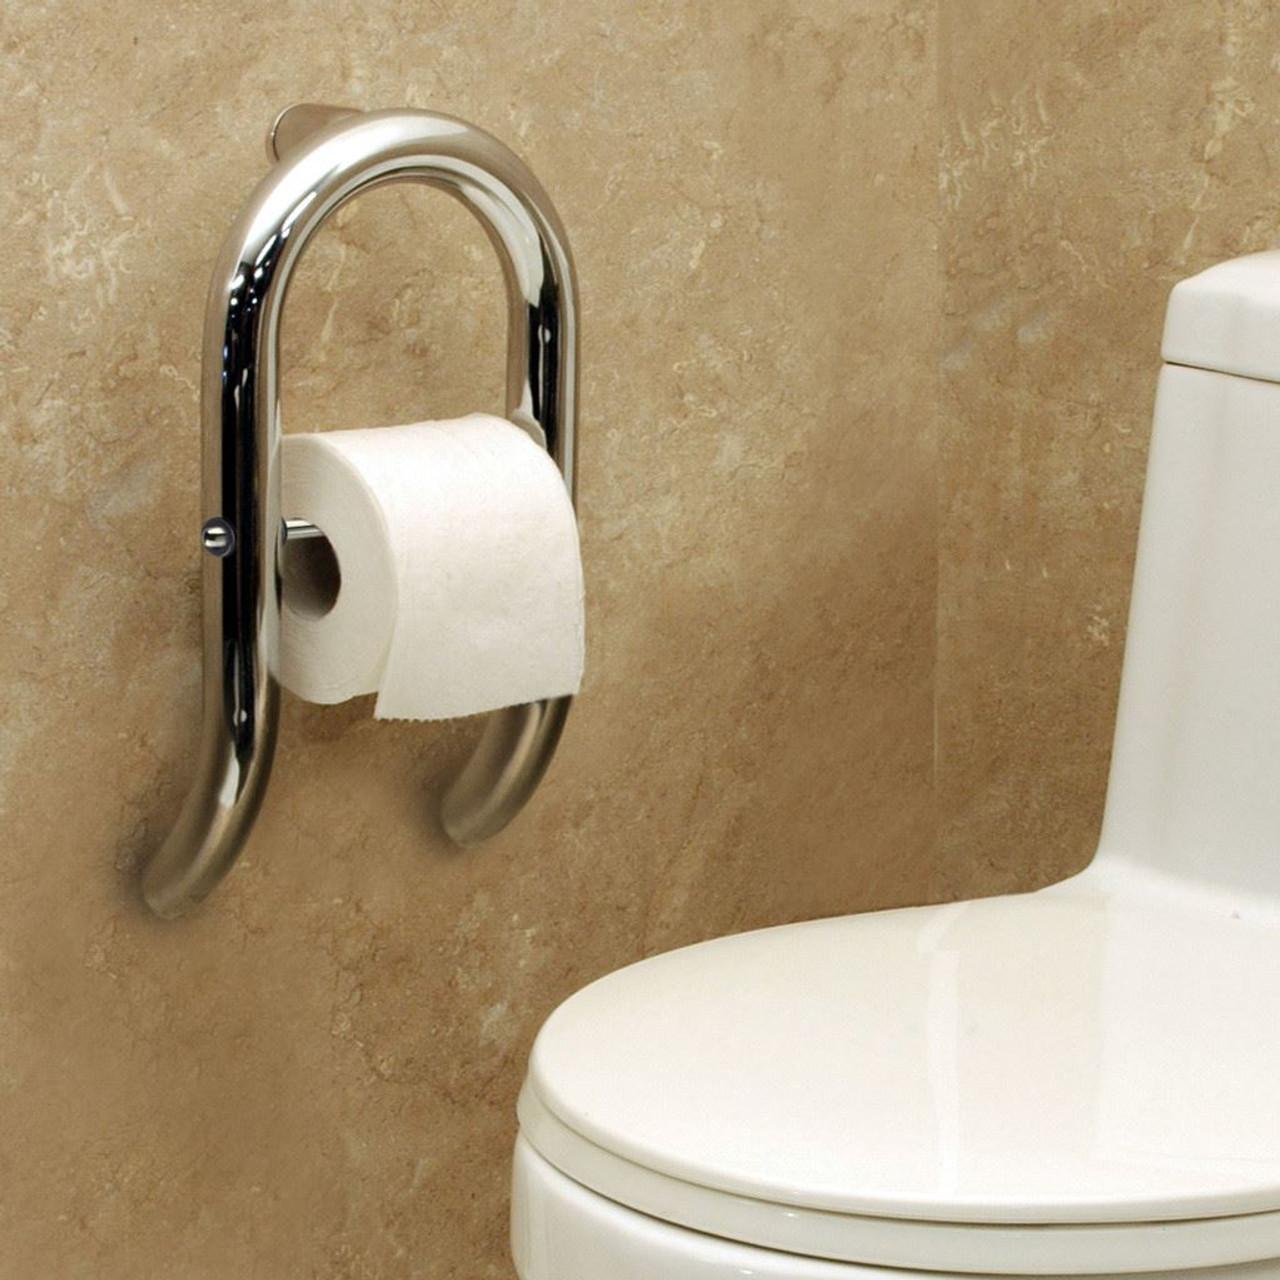 f0a90daf31b Toilet Paper Holder + Integrated Grab Bar